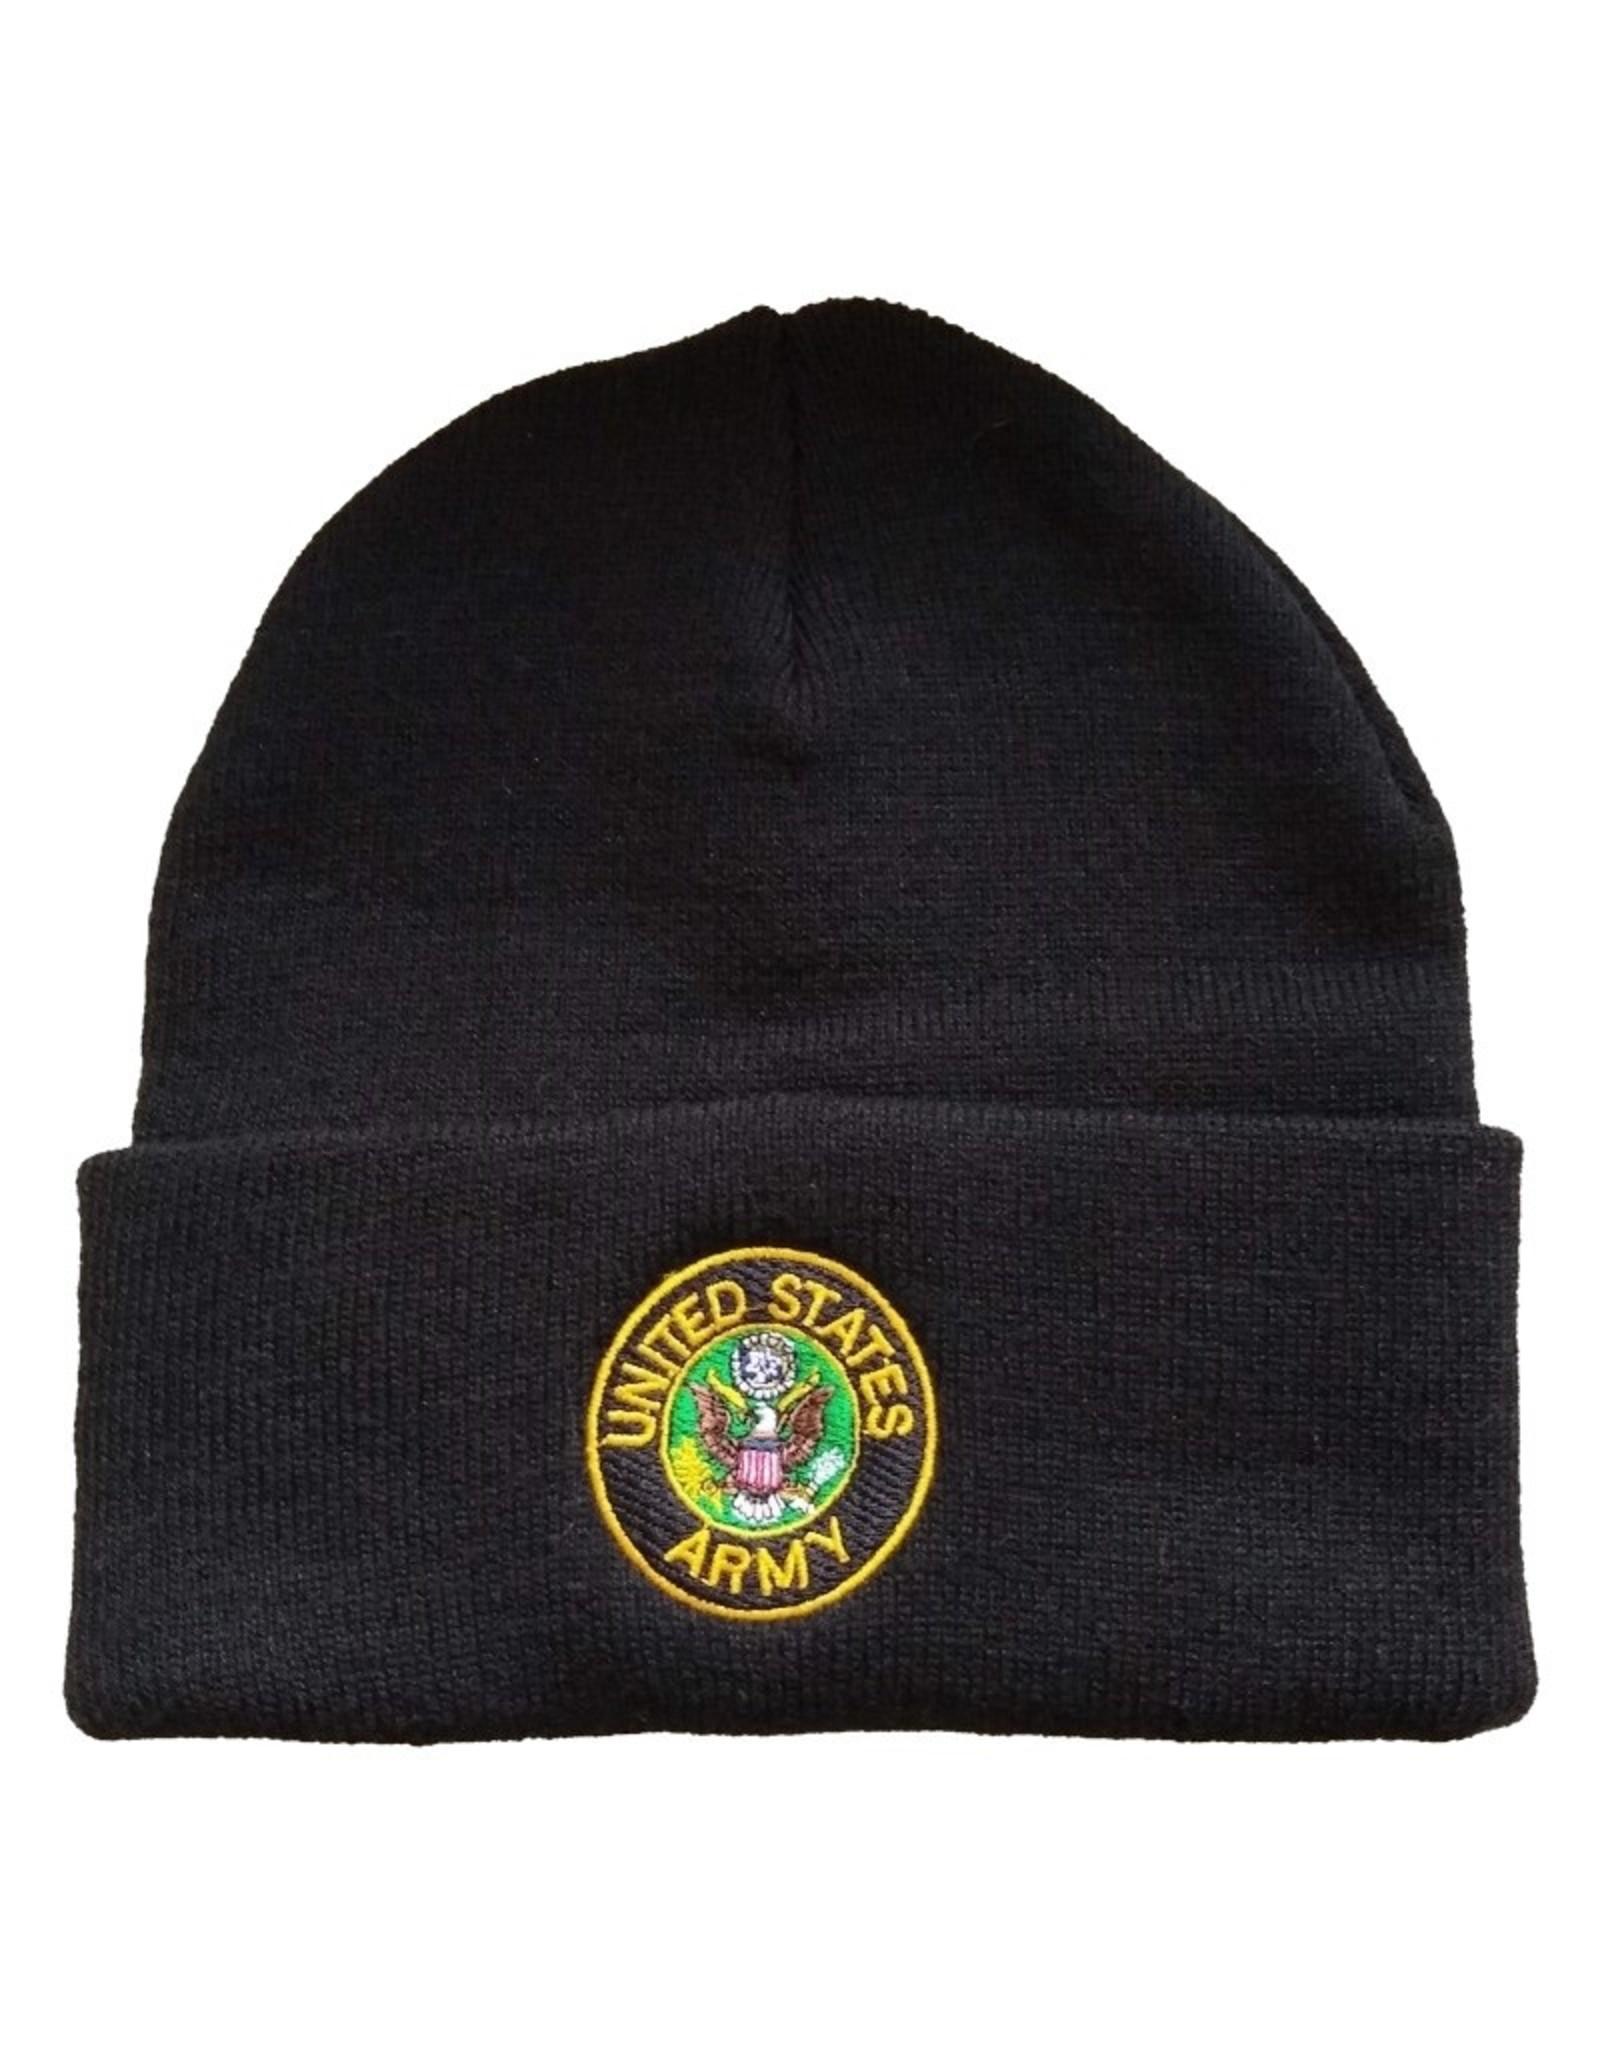 MidMil U.S. Army Cuffed Knit Hat with Army Seal Black